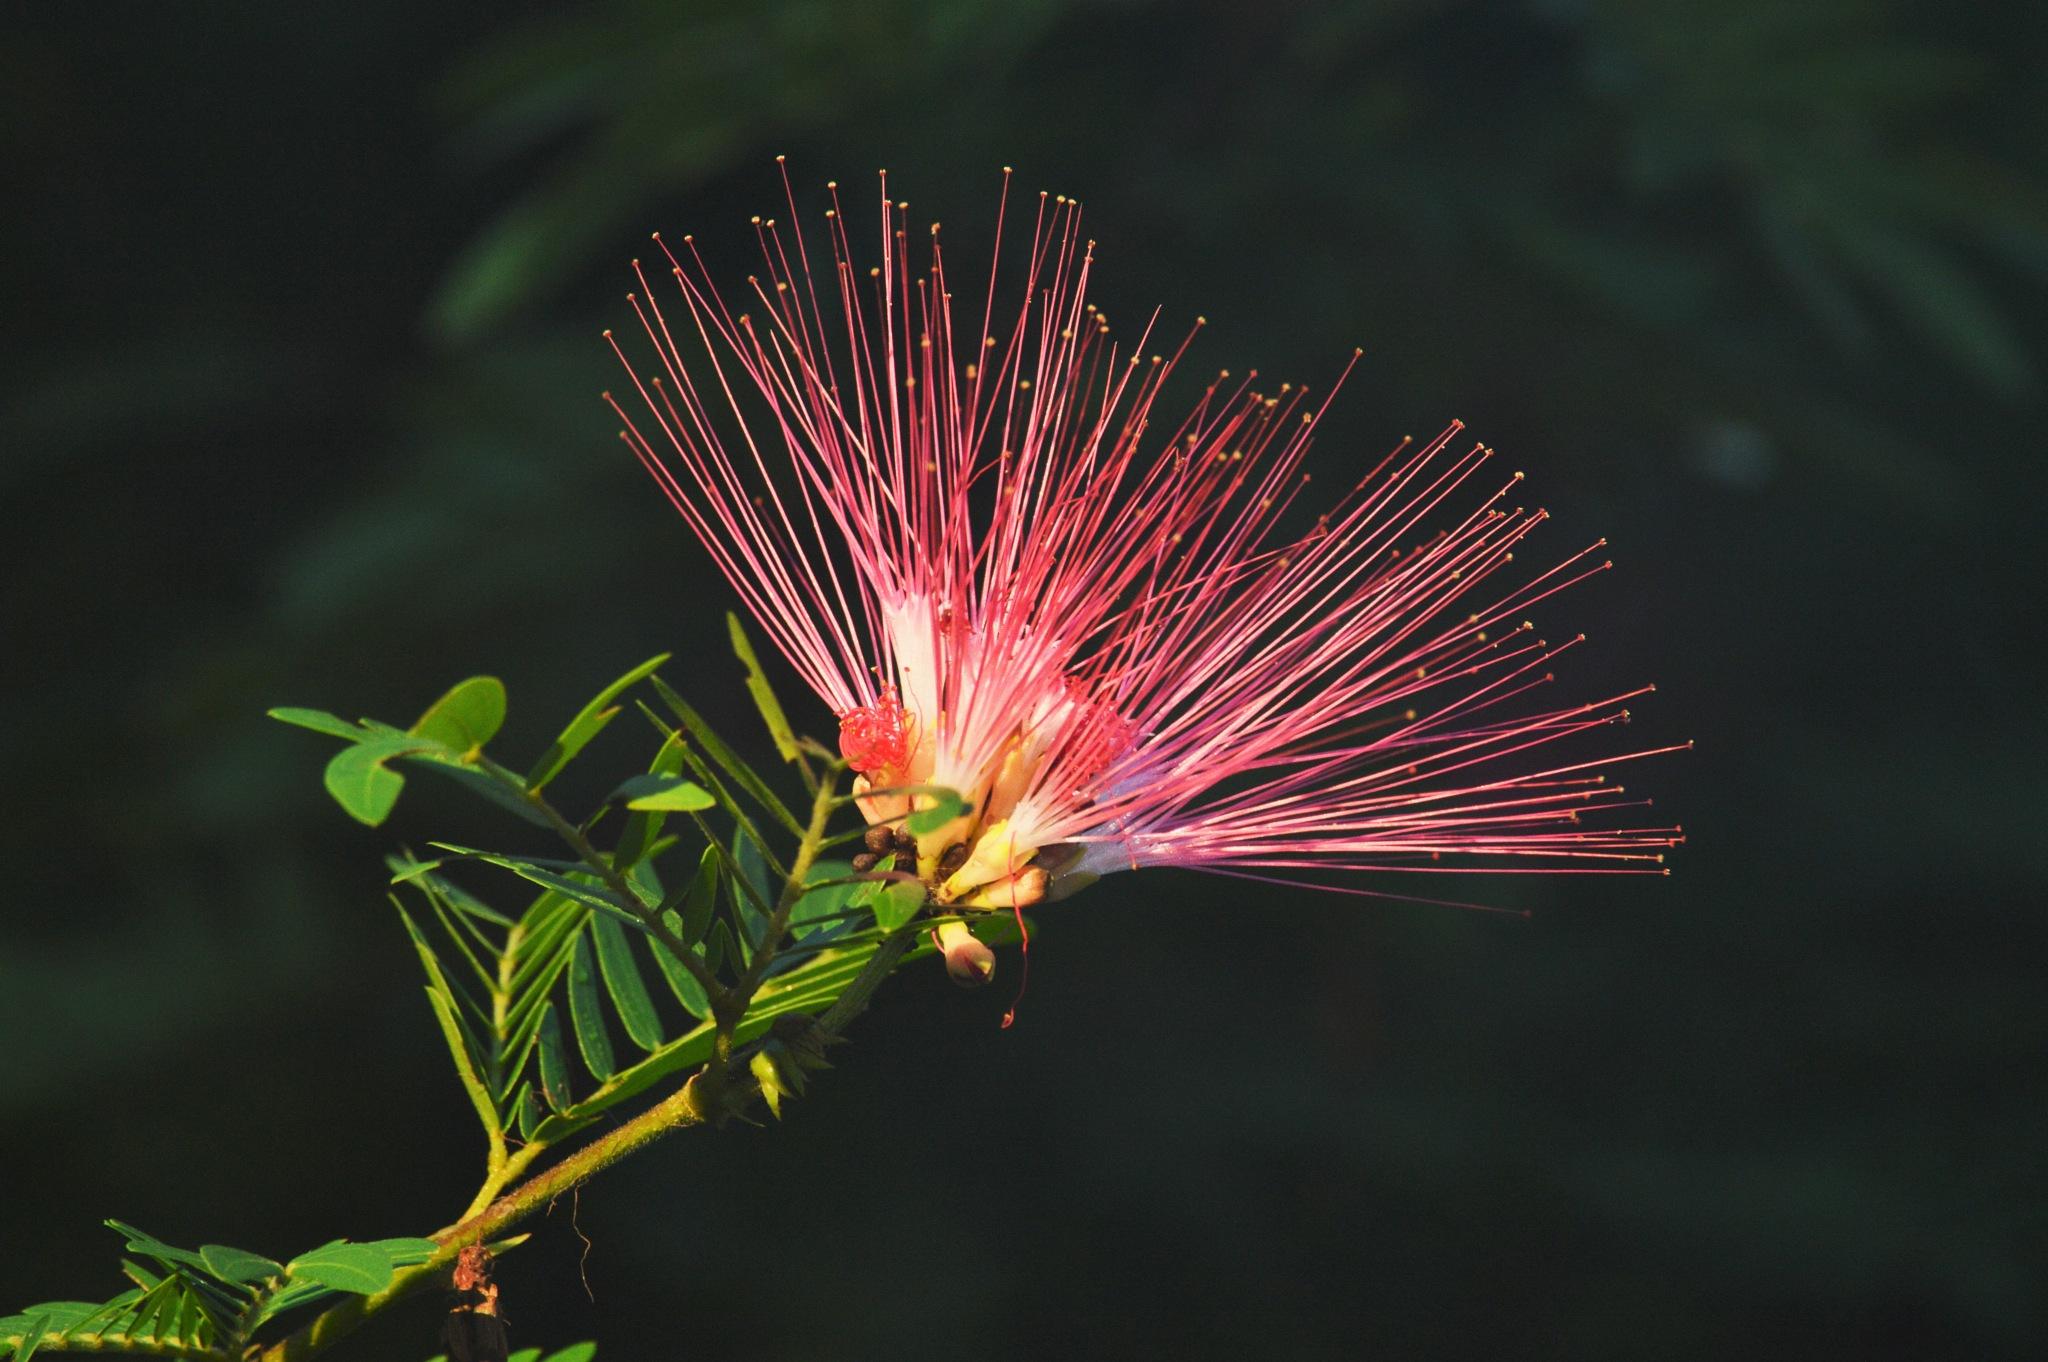 Flower Power by LydiaJeanMay